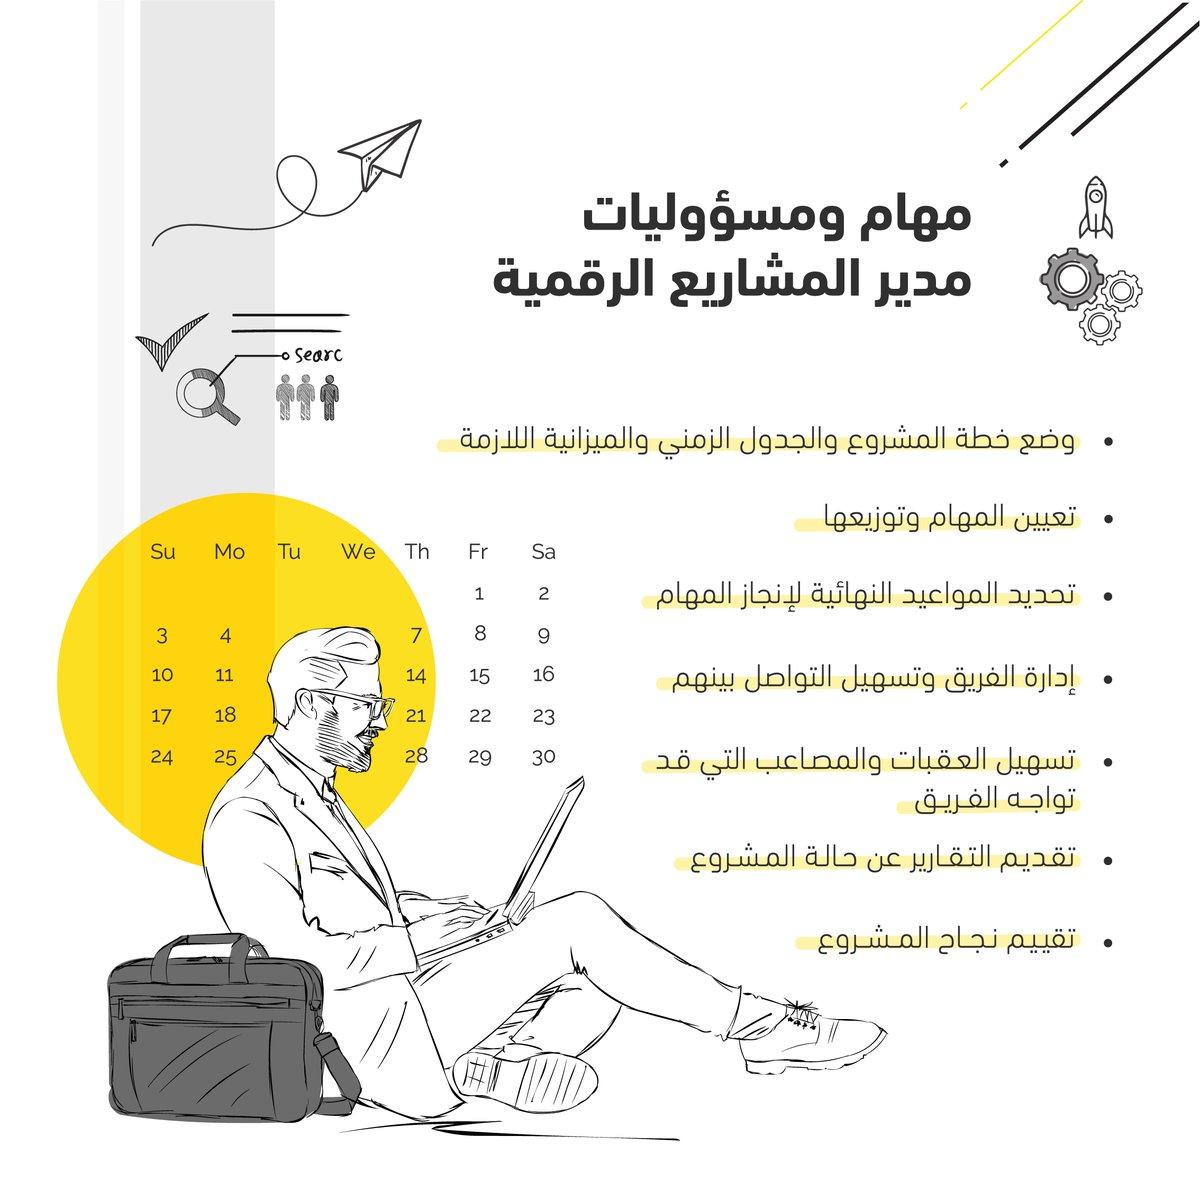 Pixel Arabia On Twitter دور مدير المشاريع الرقمية